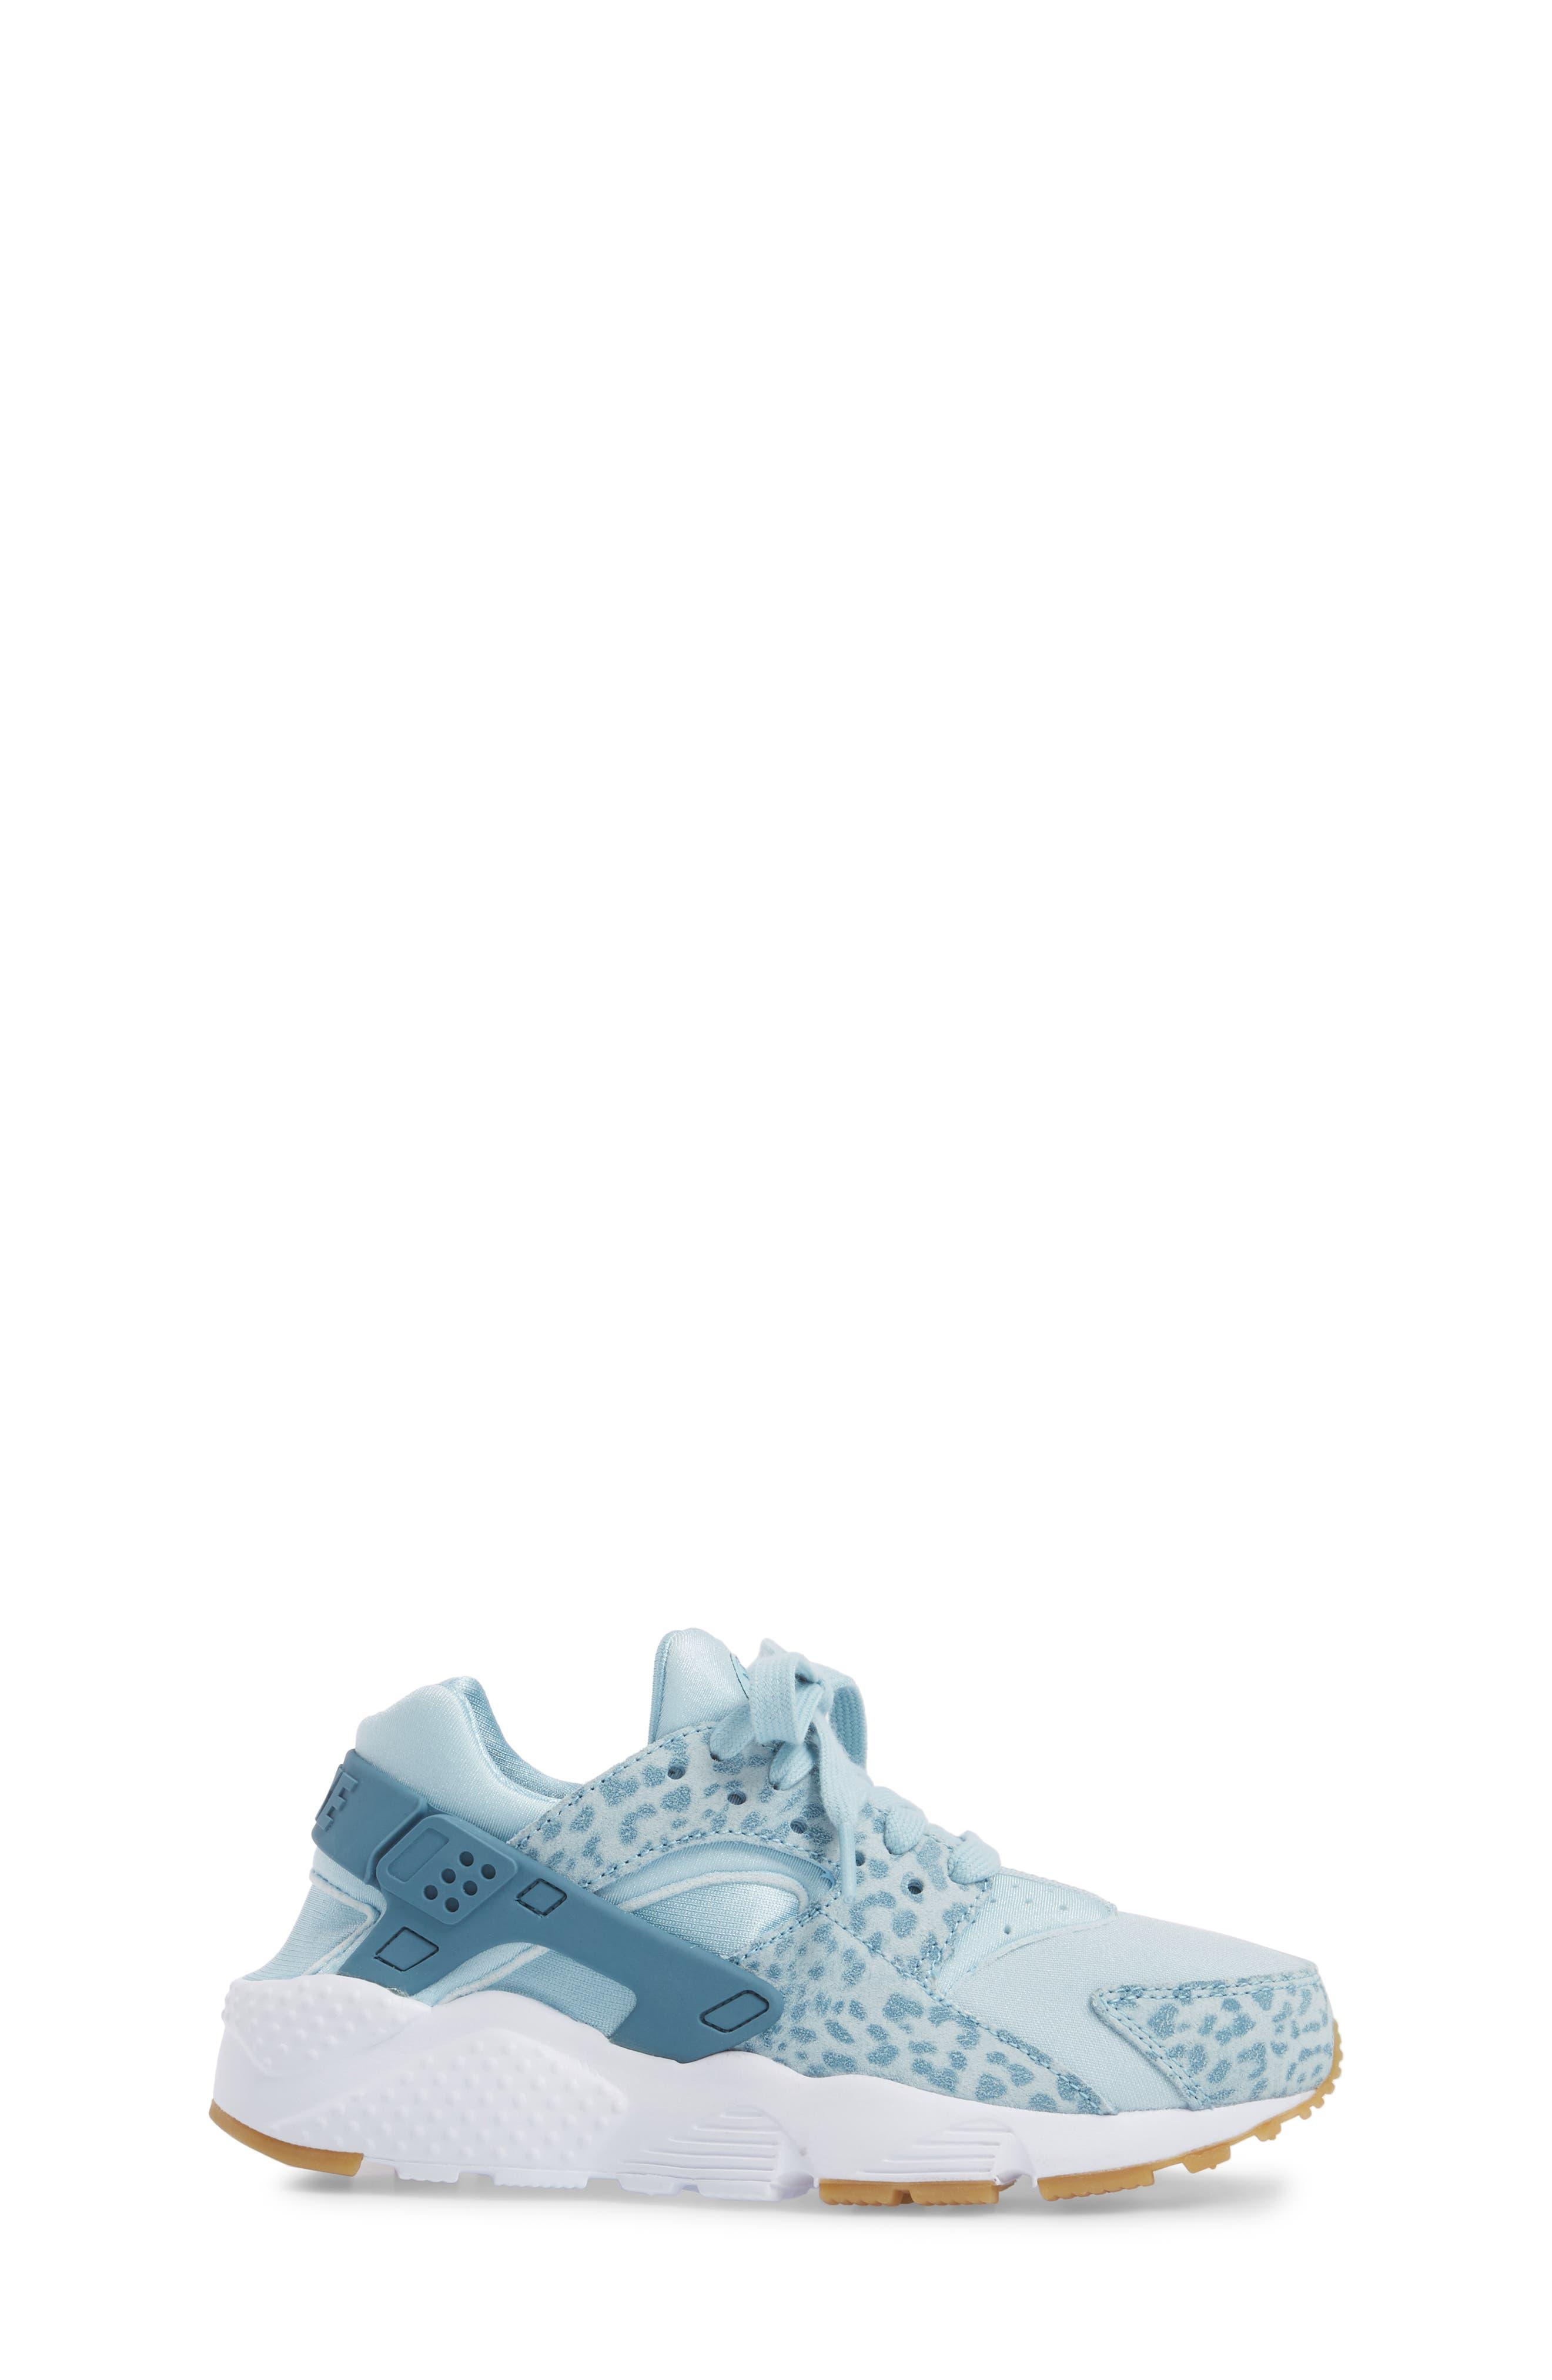 Alternate Image 3  - Nike Huarache Run SE Sneaker (Baby, Walker, Toddler, Little Kid & Big Kid)